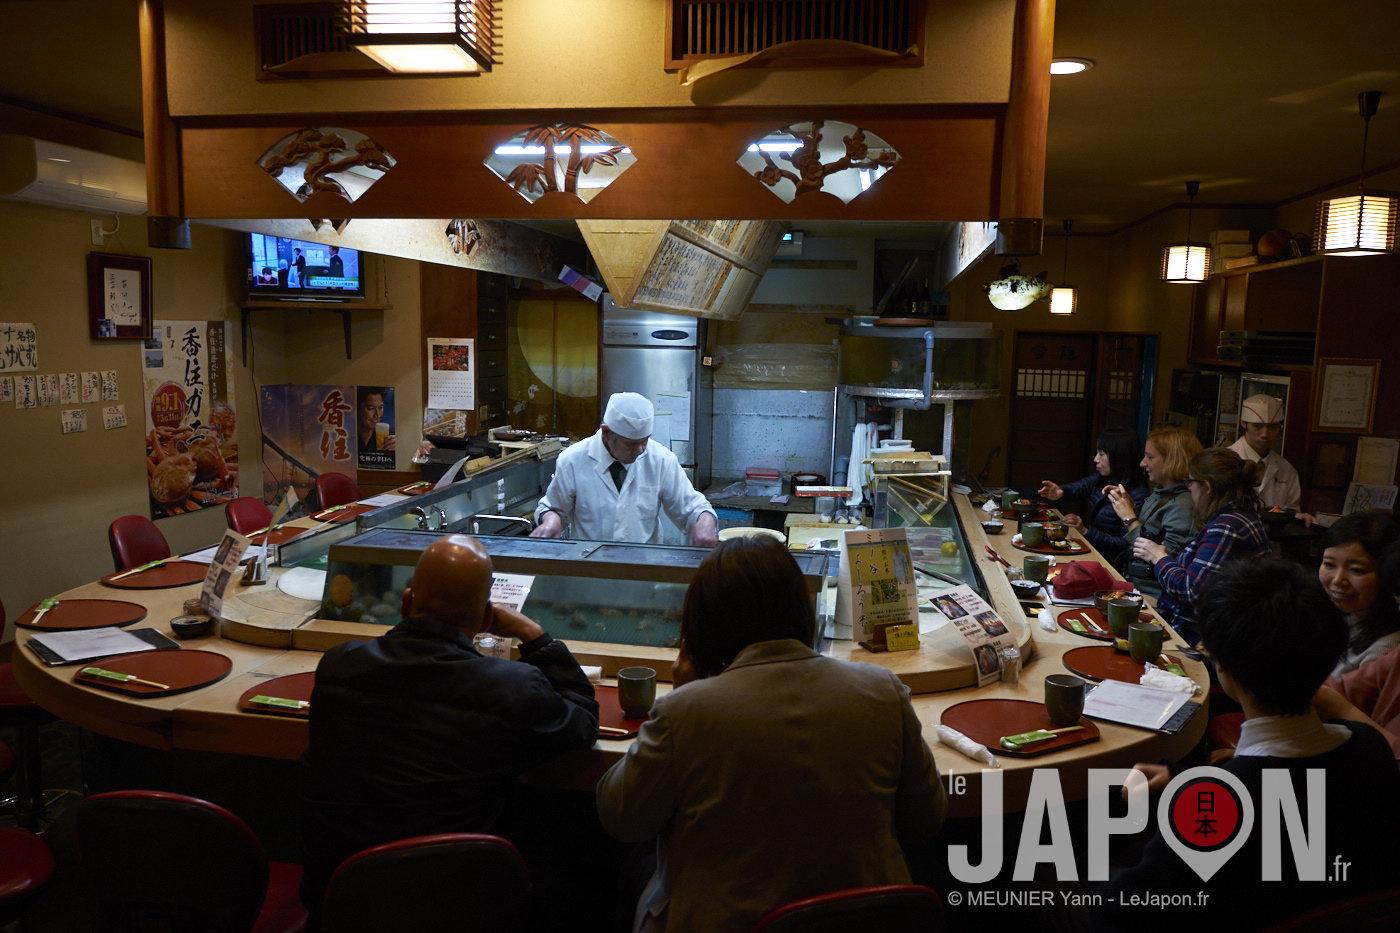 Minatokan Restaurantde Sushi à Hyogo Japon